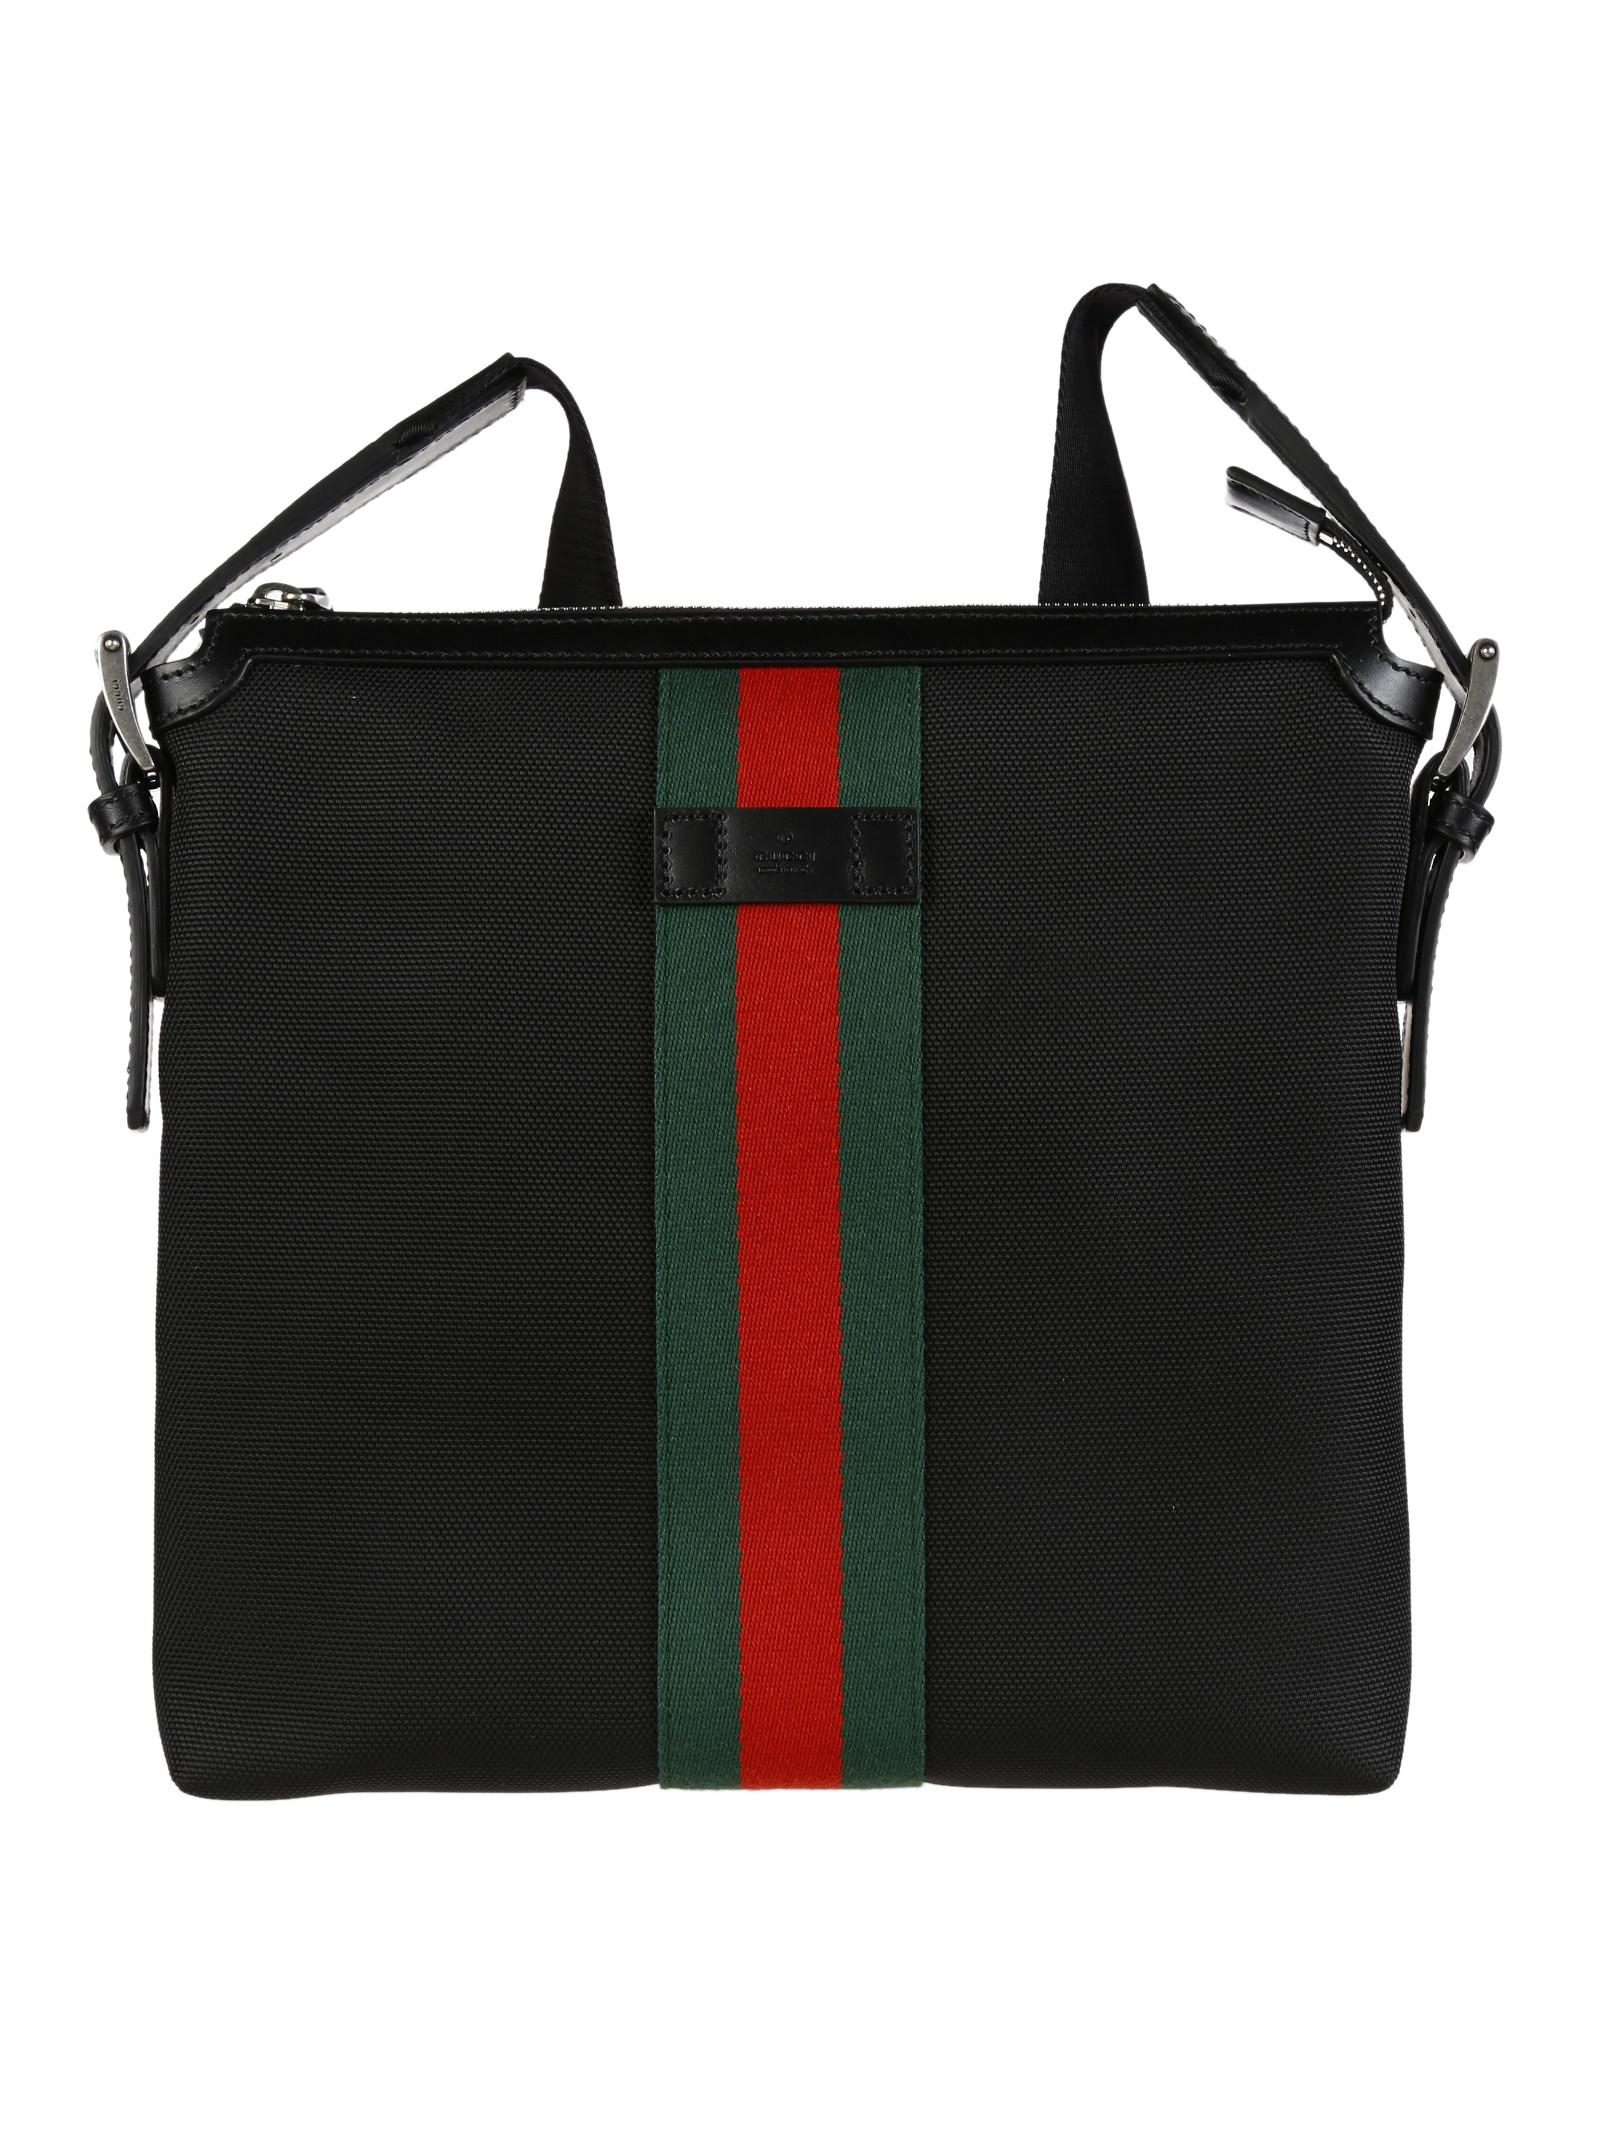 gucci web band canvas small messenger bag in black for men lyst. Black Bedroom Furniture Sets. Home Design Ideas